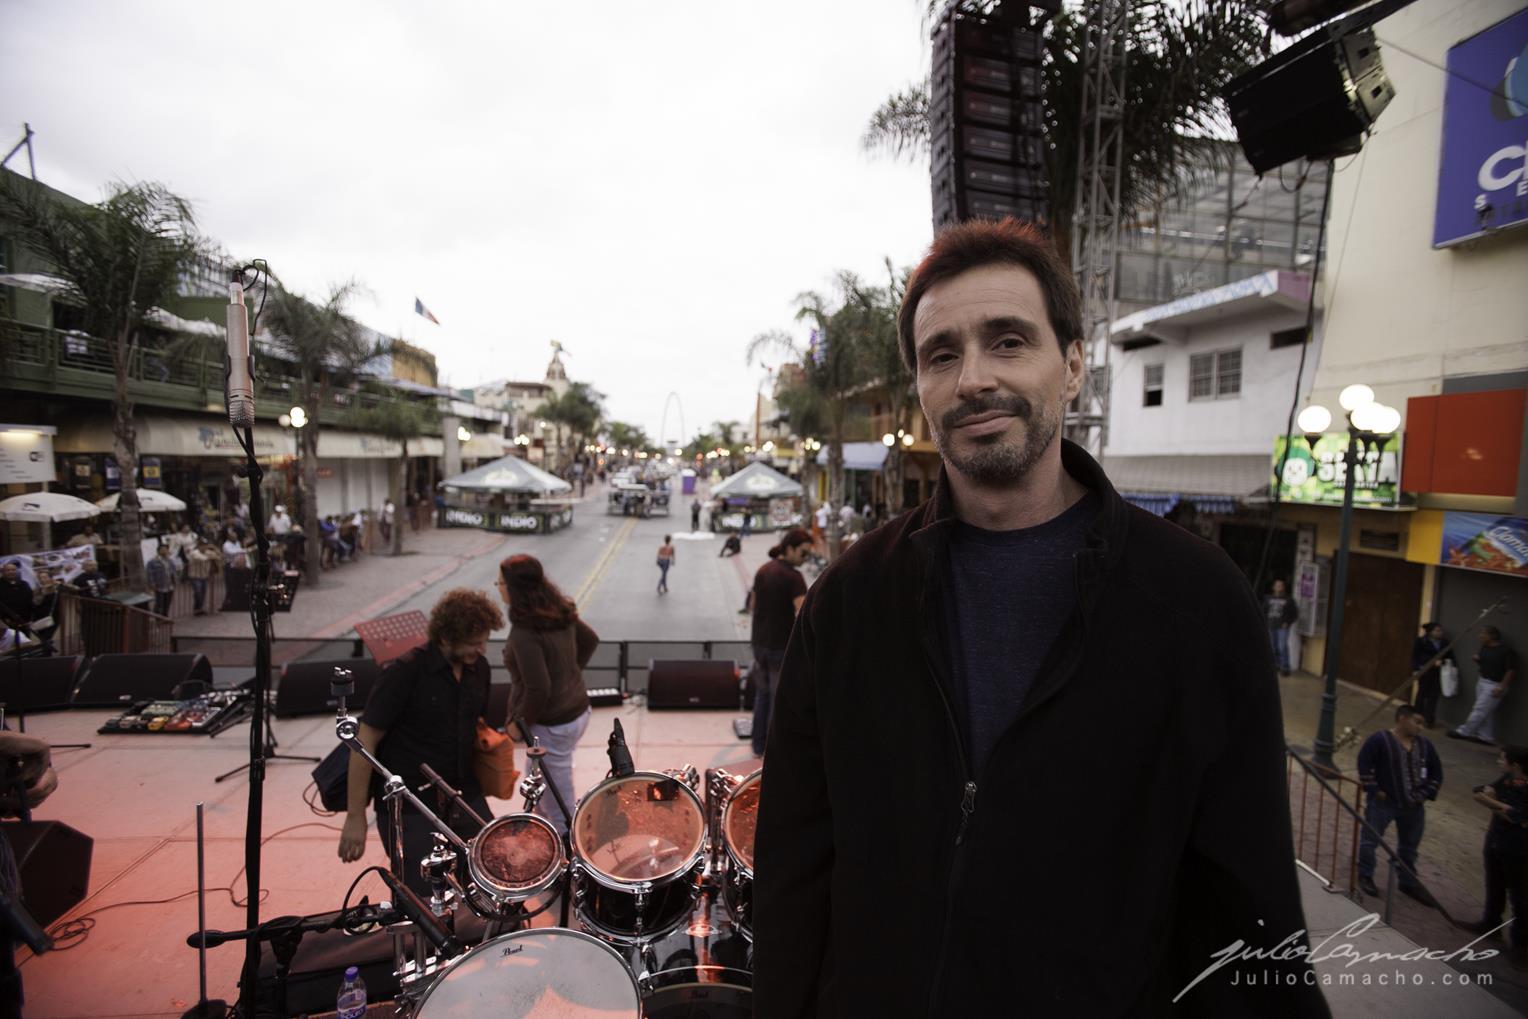 2014-10-30 31 CAST TOUR Ensenada y Tijuana - 1312 - www.Juli (Copy).jpg